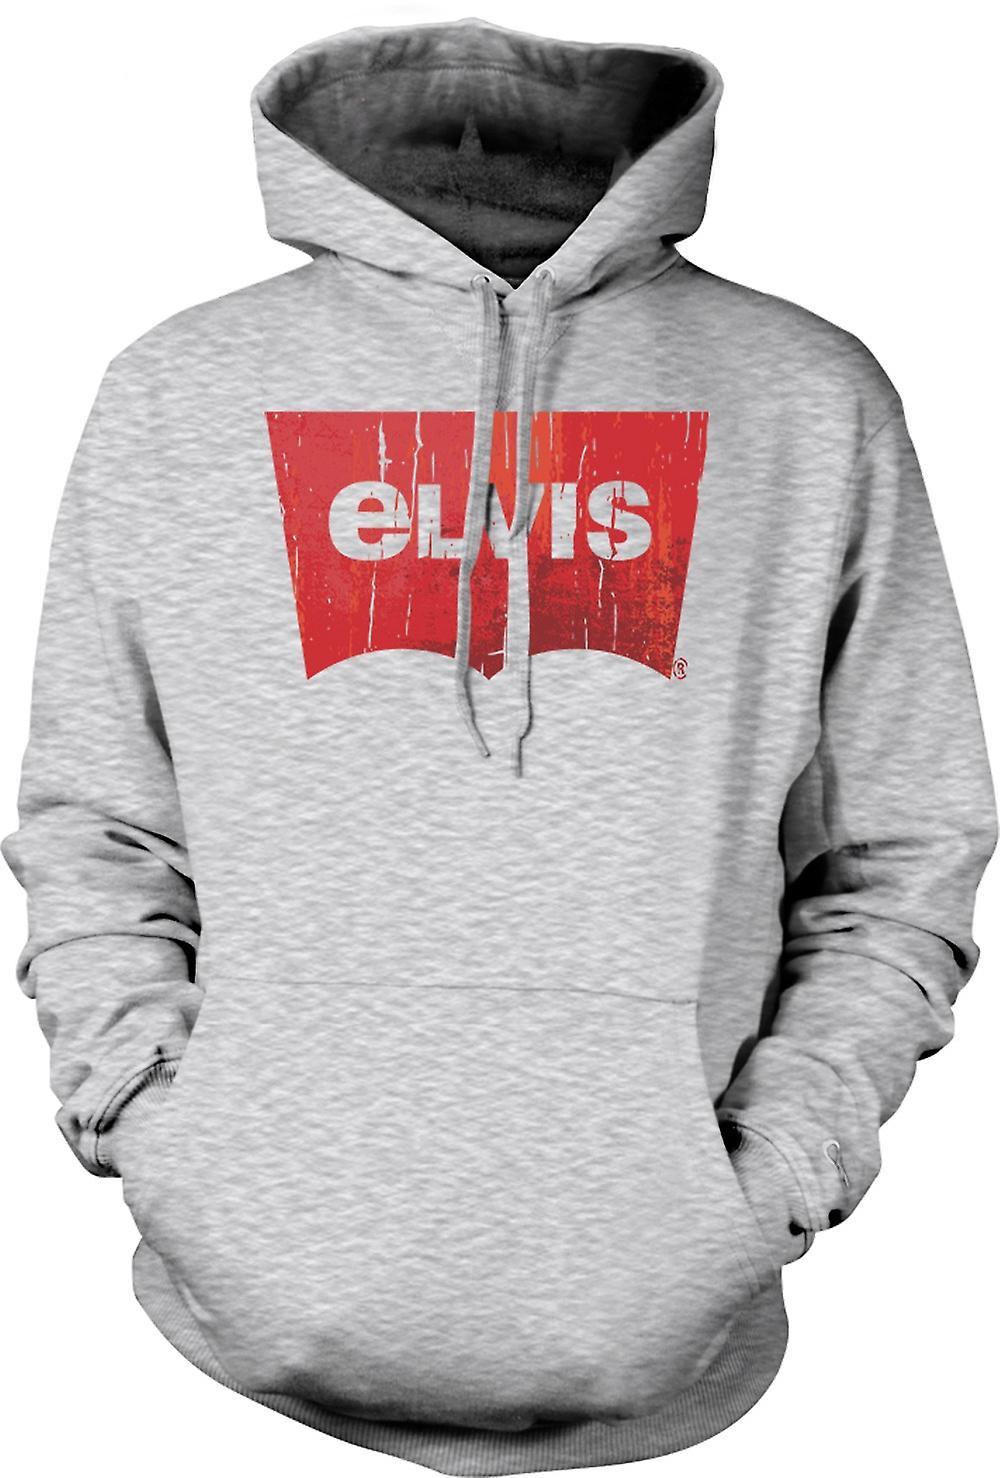 Mens-Hoodie - Elvis - Levis inspiriert